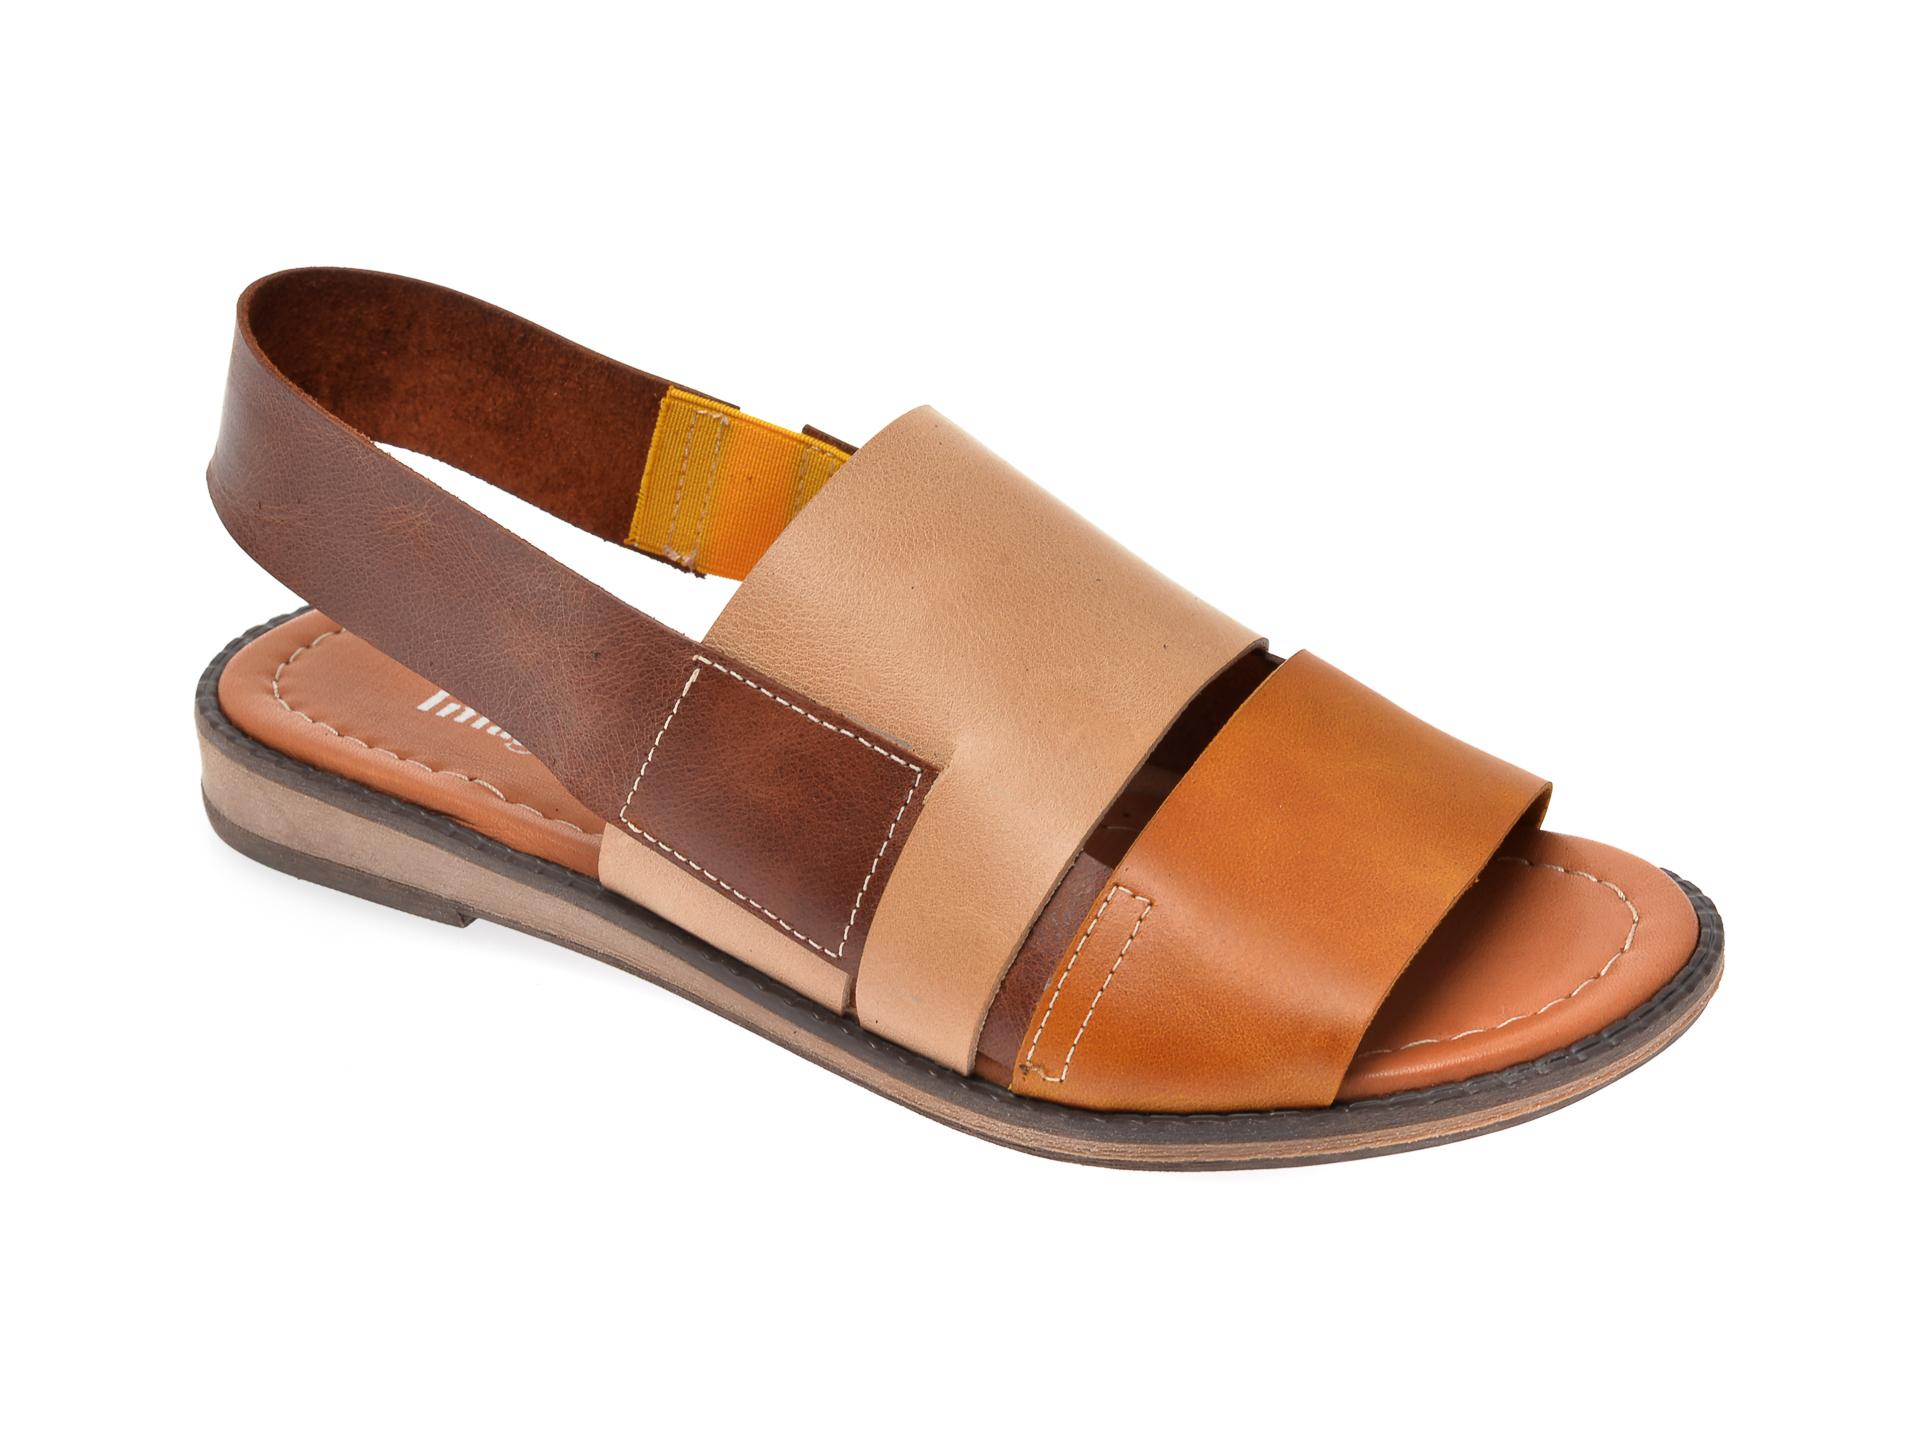 Sandale IMAGE bej, 122, din piele naturala